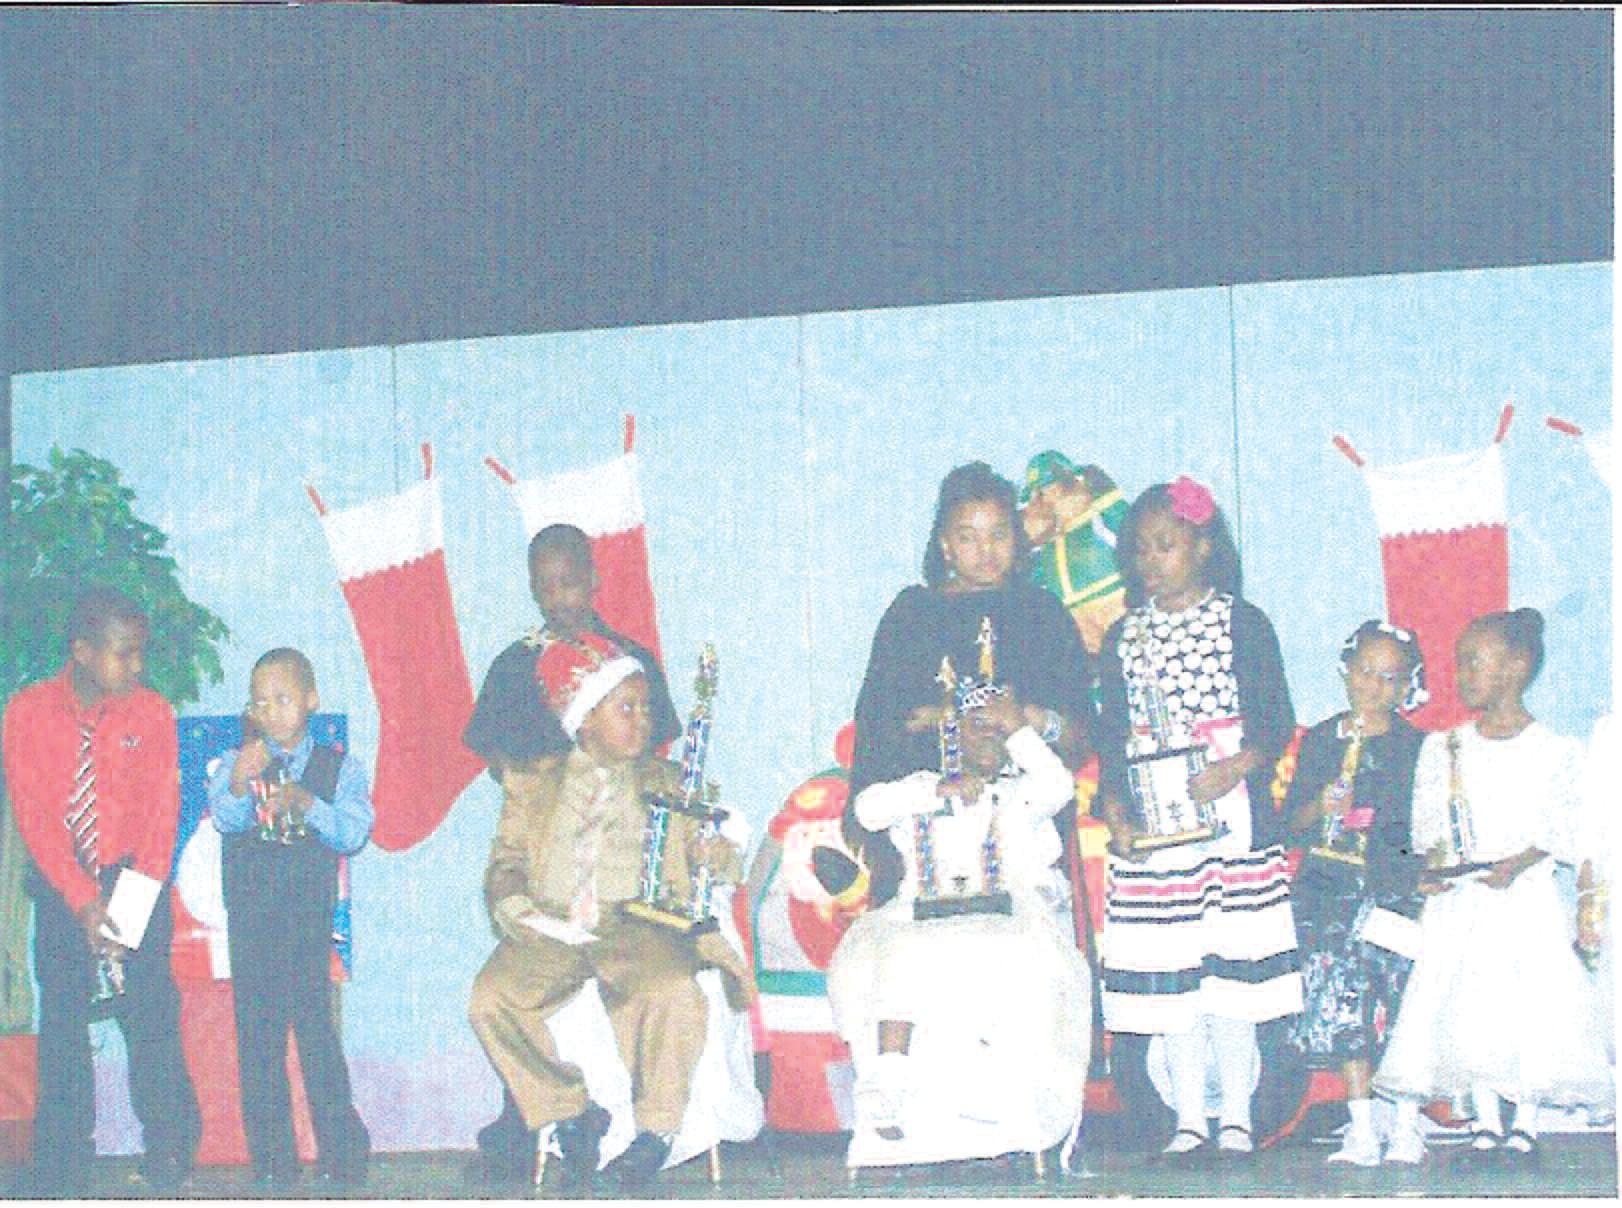 Participants of the Top Ladies' Kiddie Kotillion